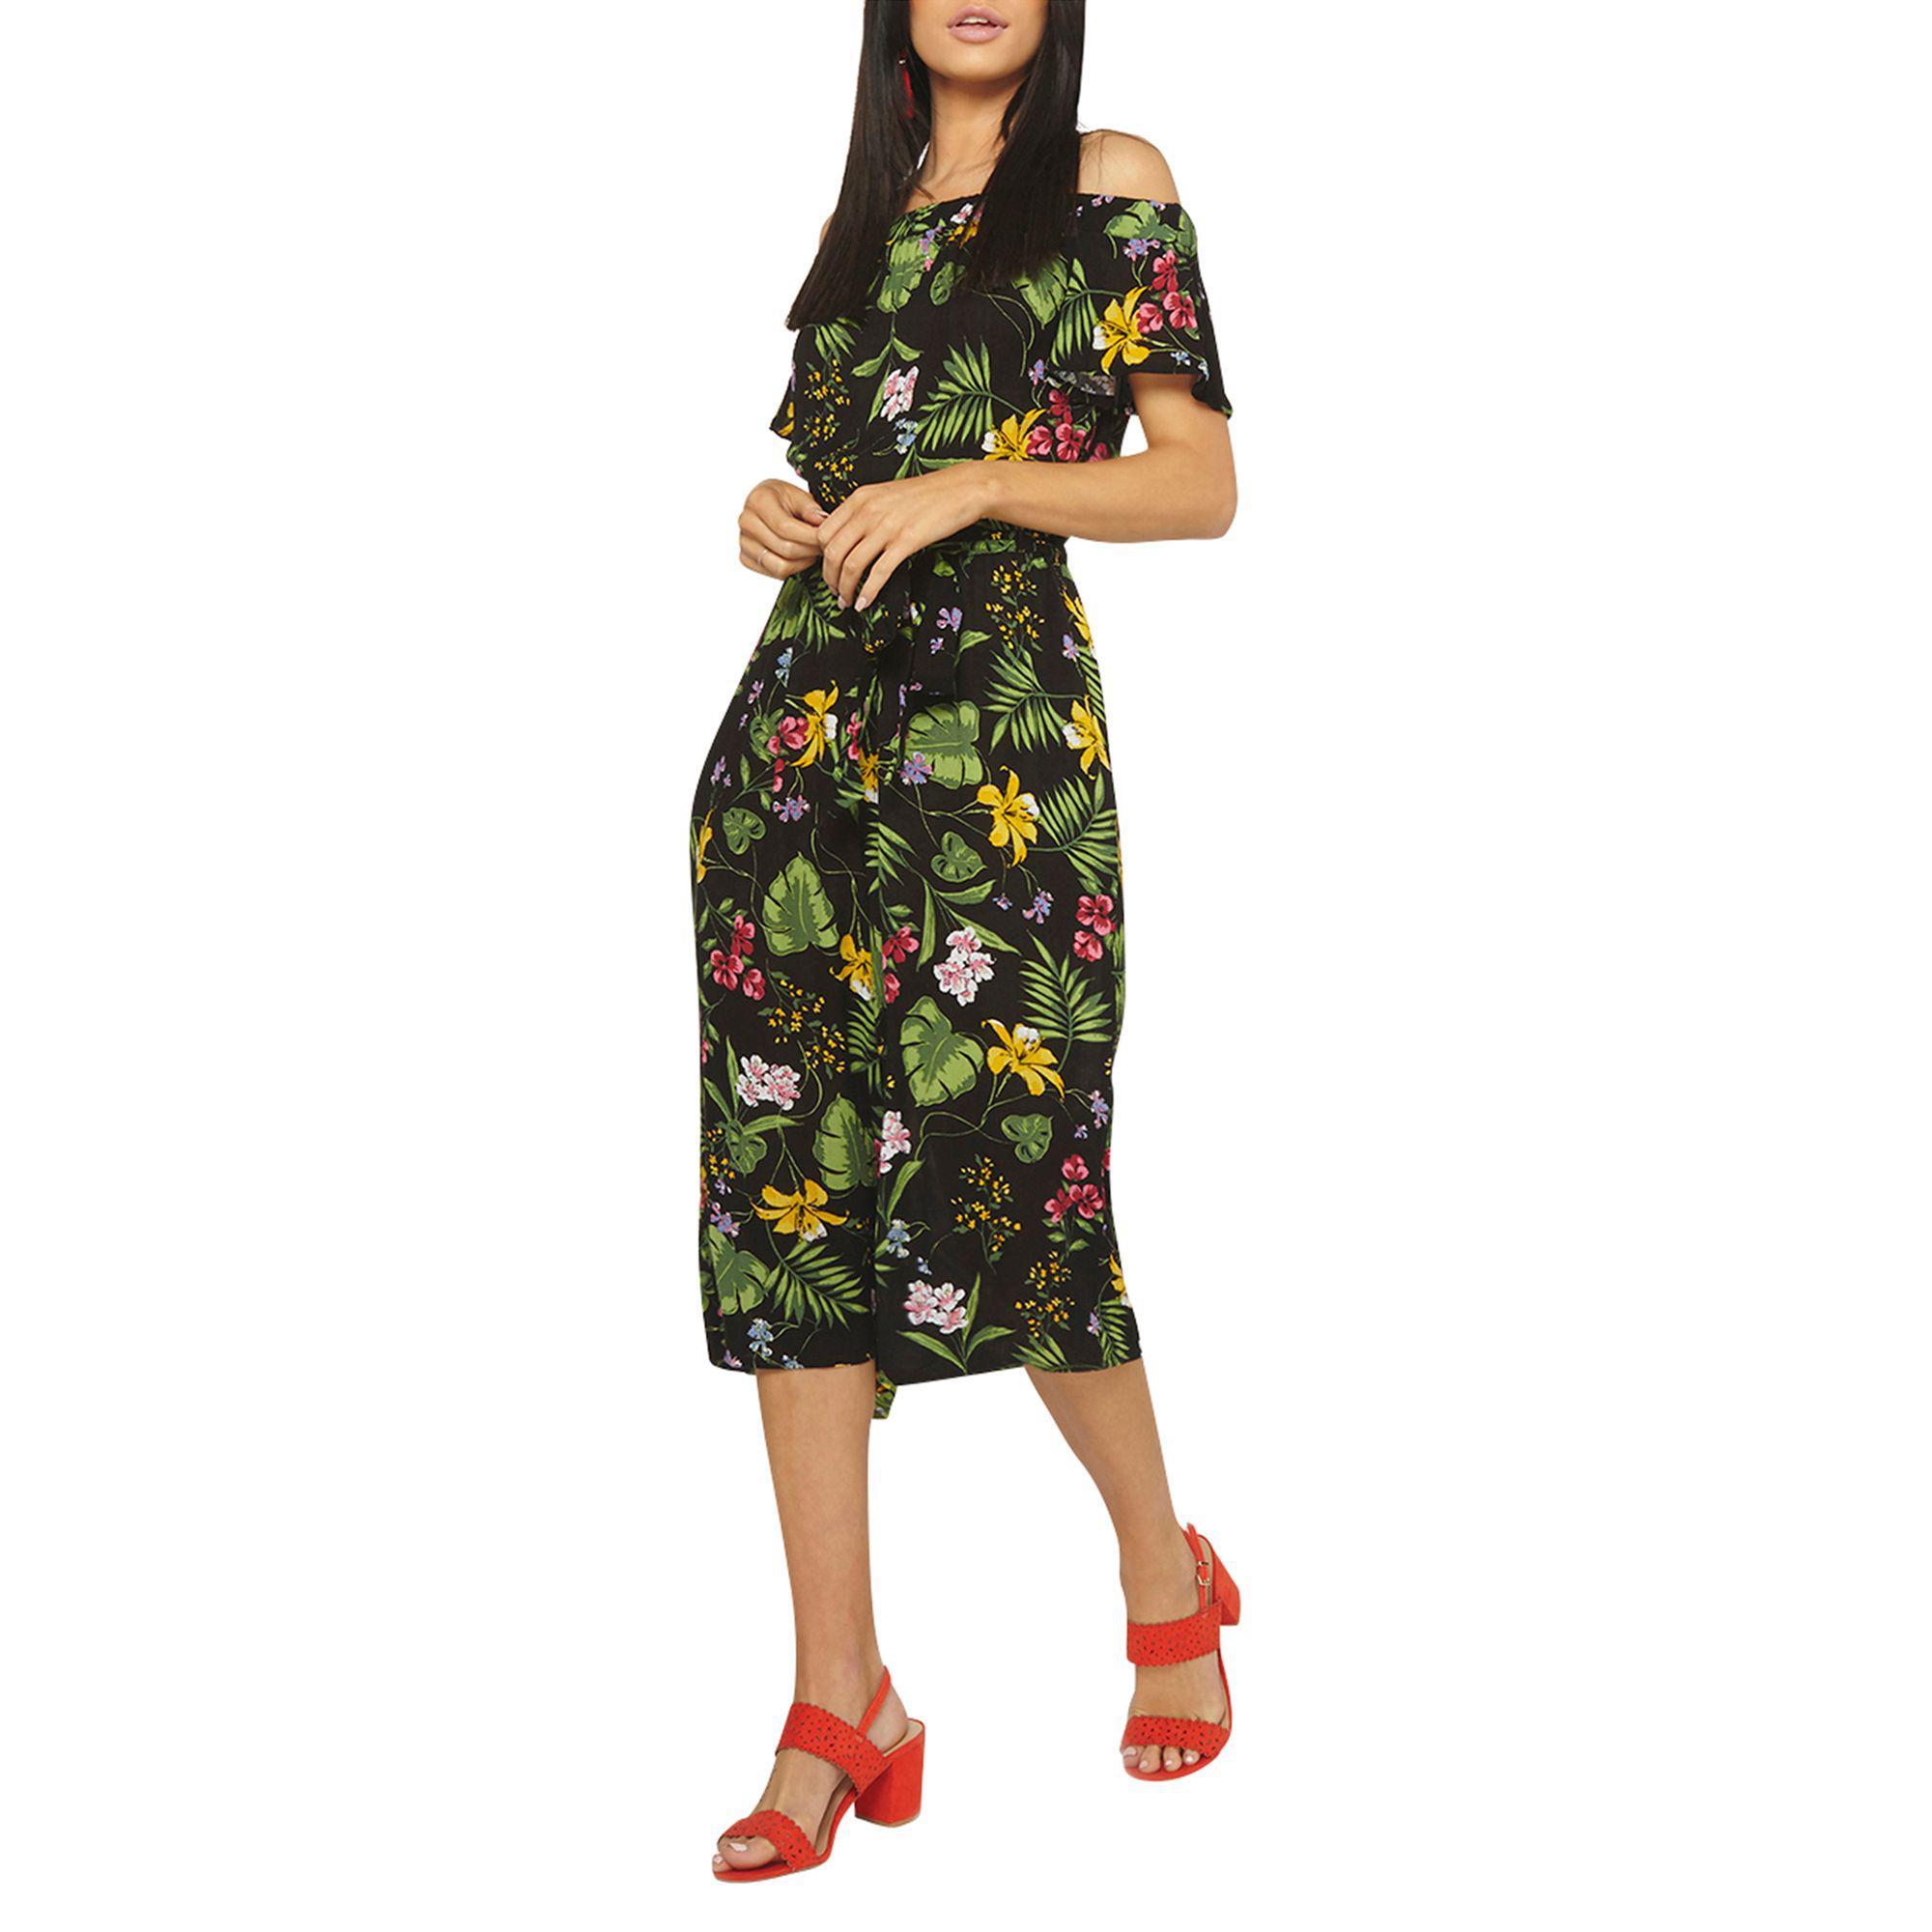 b40cd57c7a5d Dorothy Perkins Black Tropical Bardot Jumpsuit in Black - Lyst